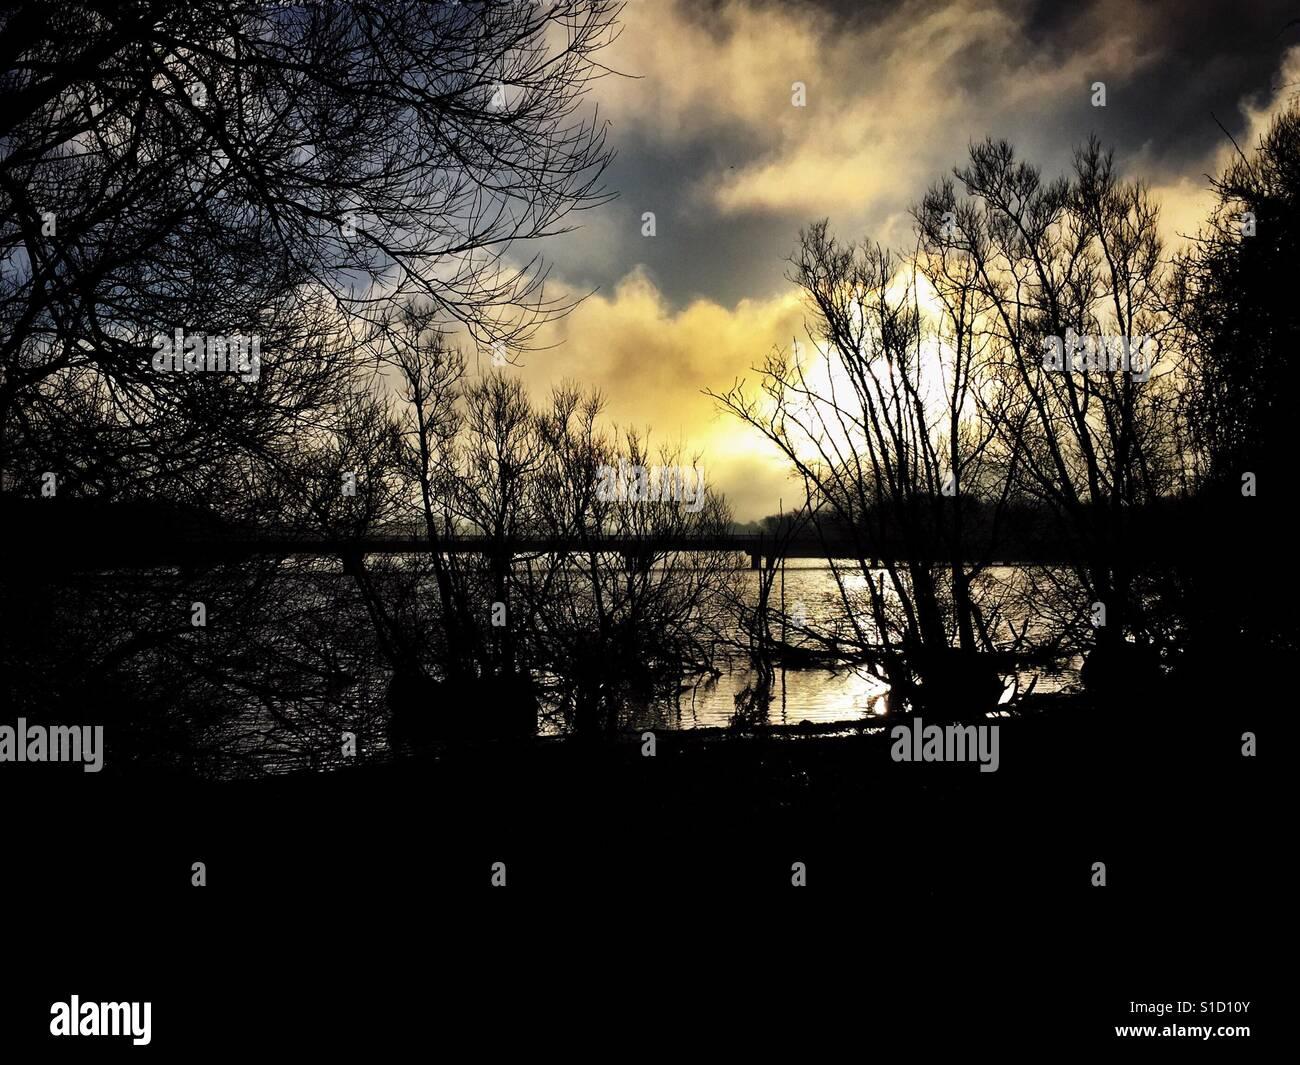 Sunrise over water - Stock Image